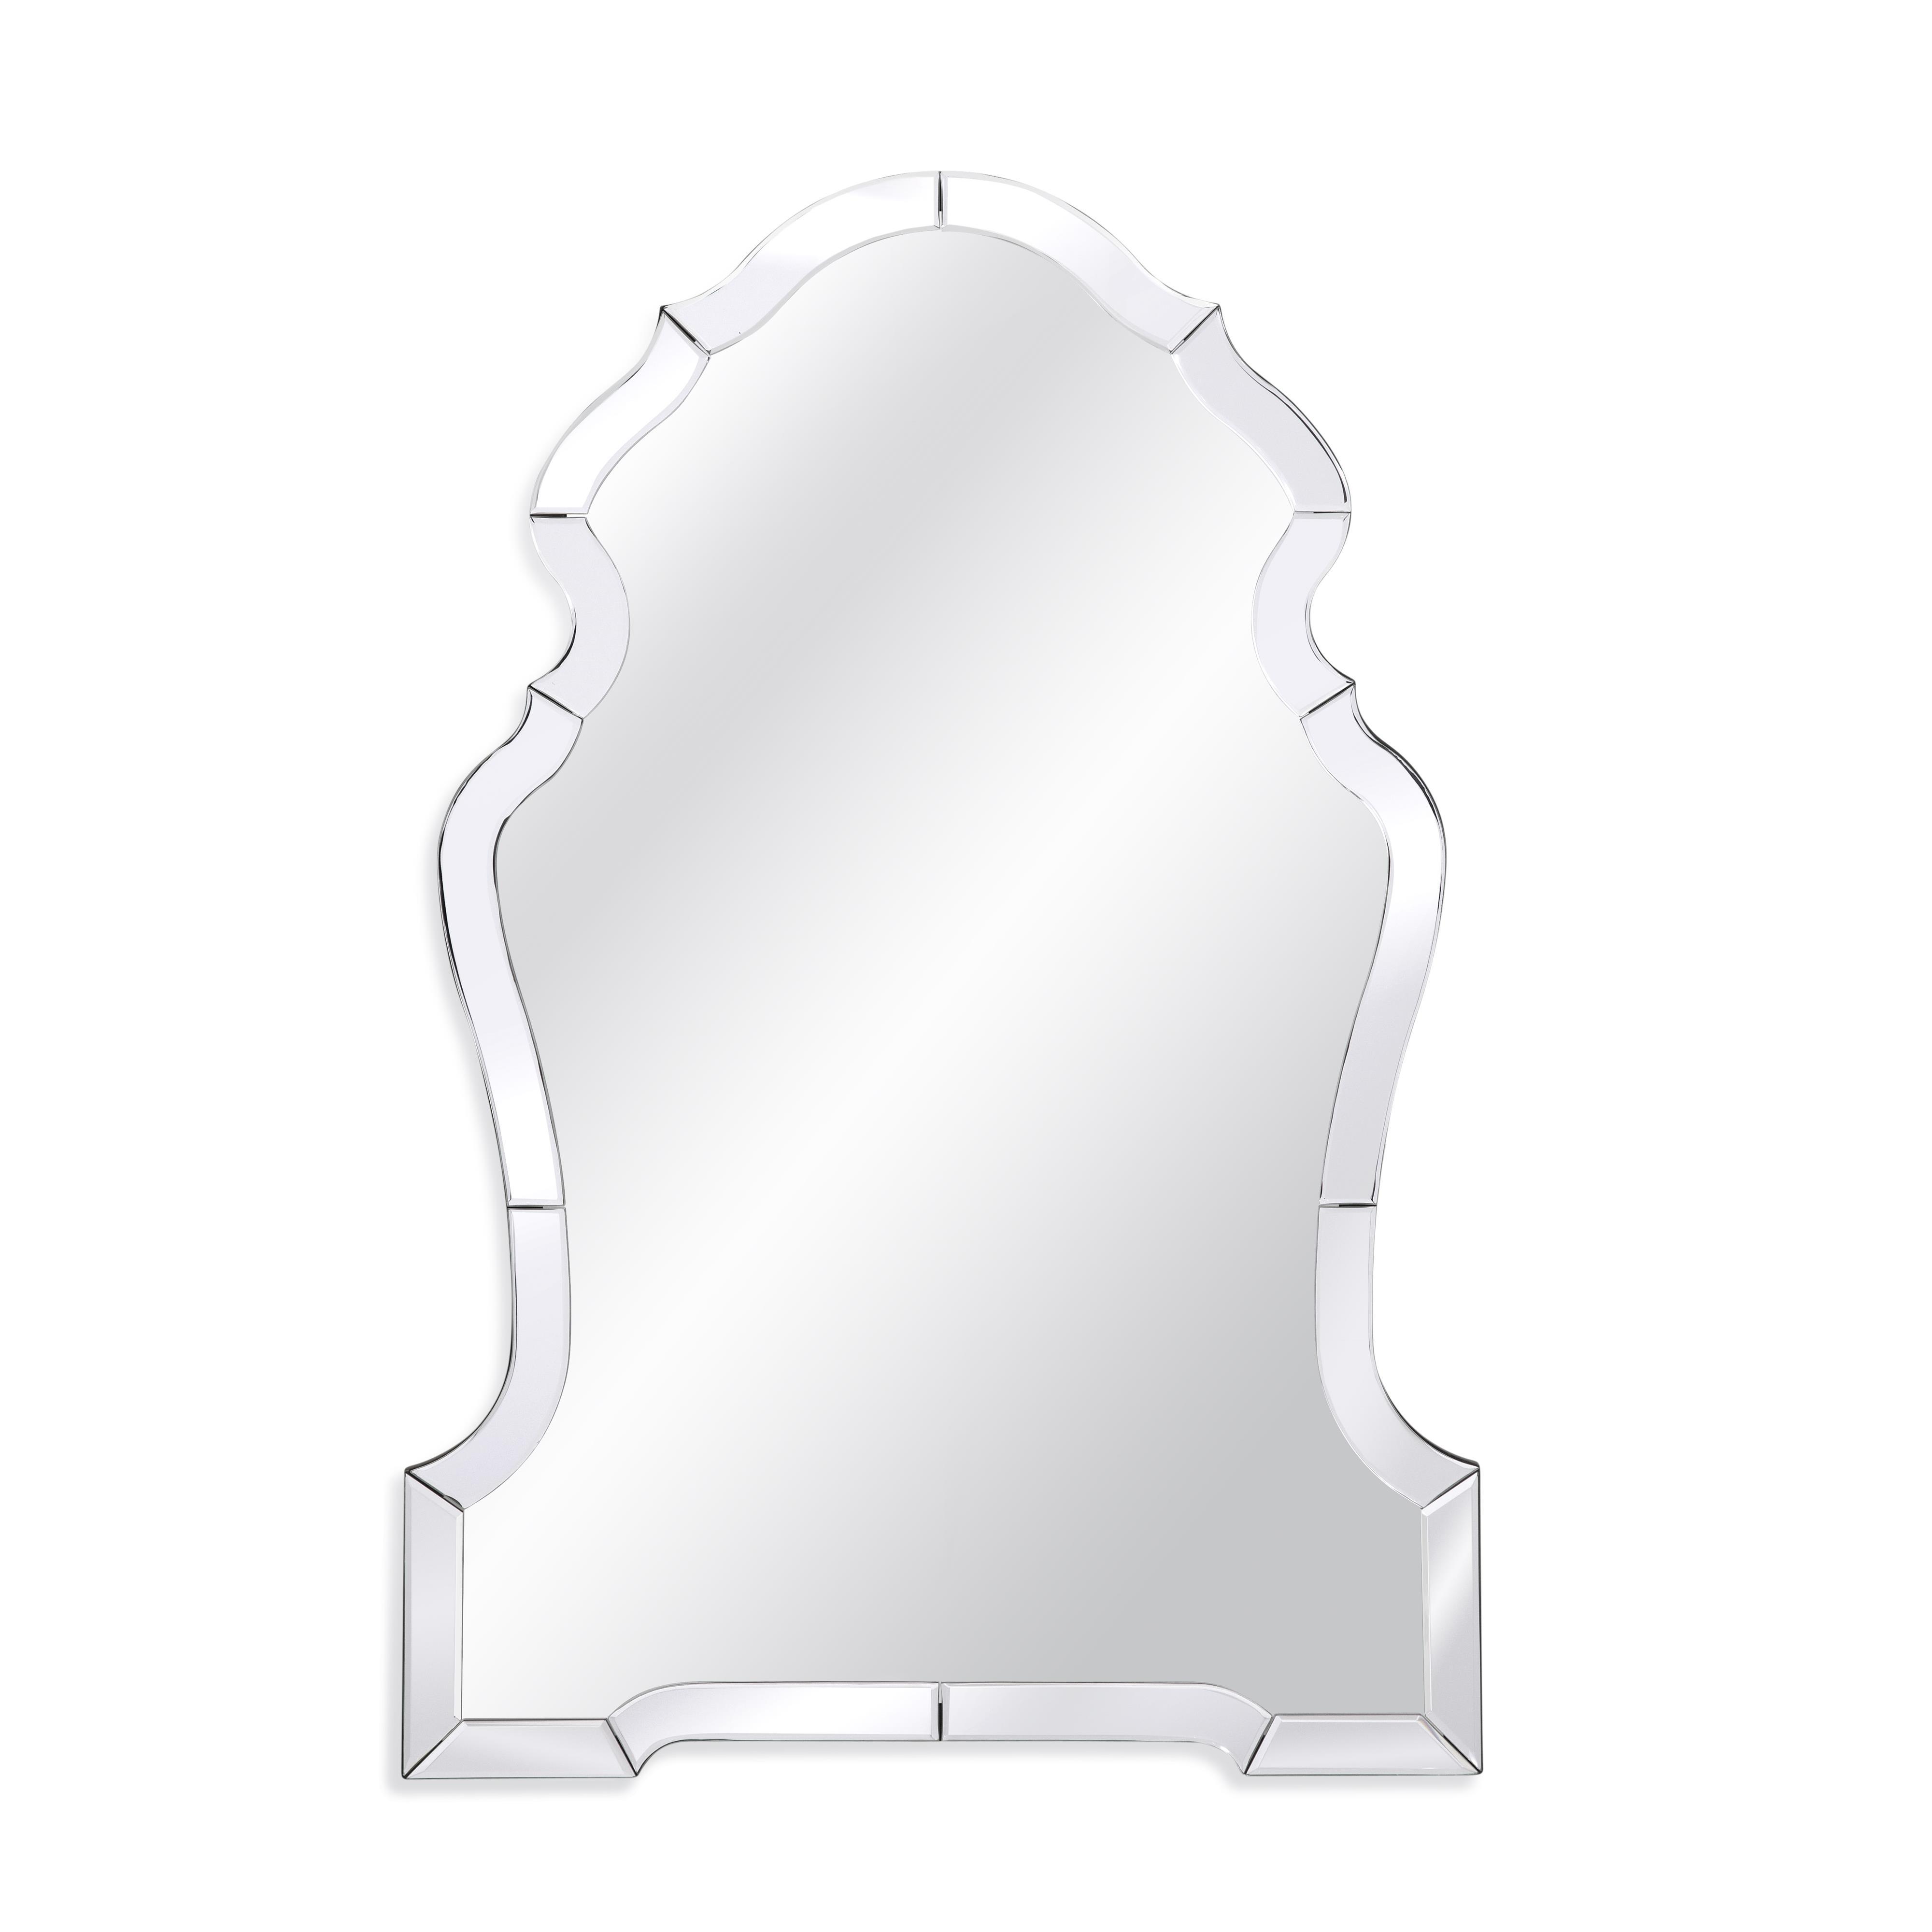 Thoroughly Modern Kyla Wall Mirror by Bassett Mirror at Alison Craig Home Furnishings